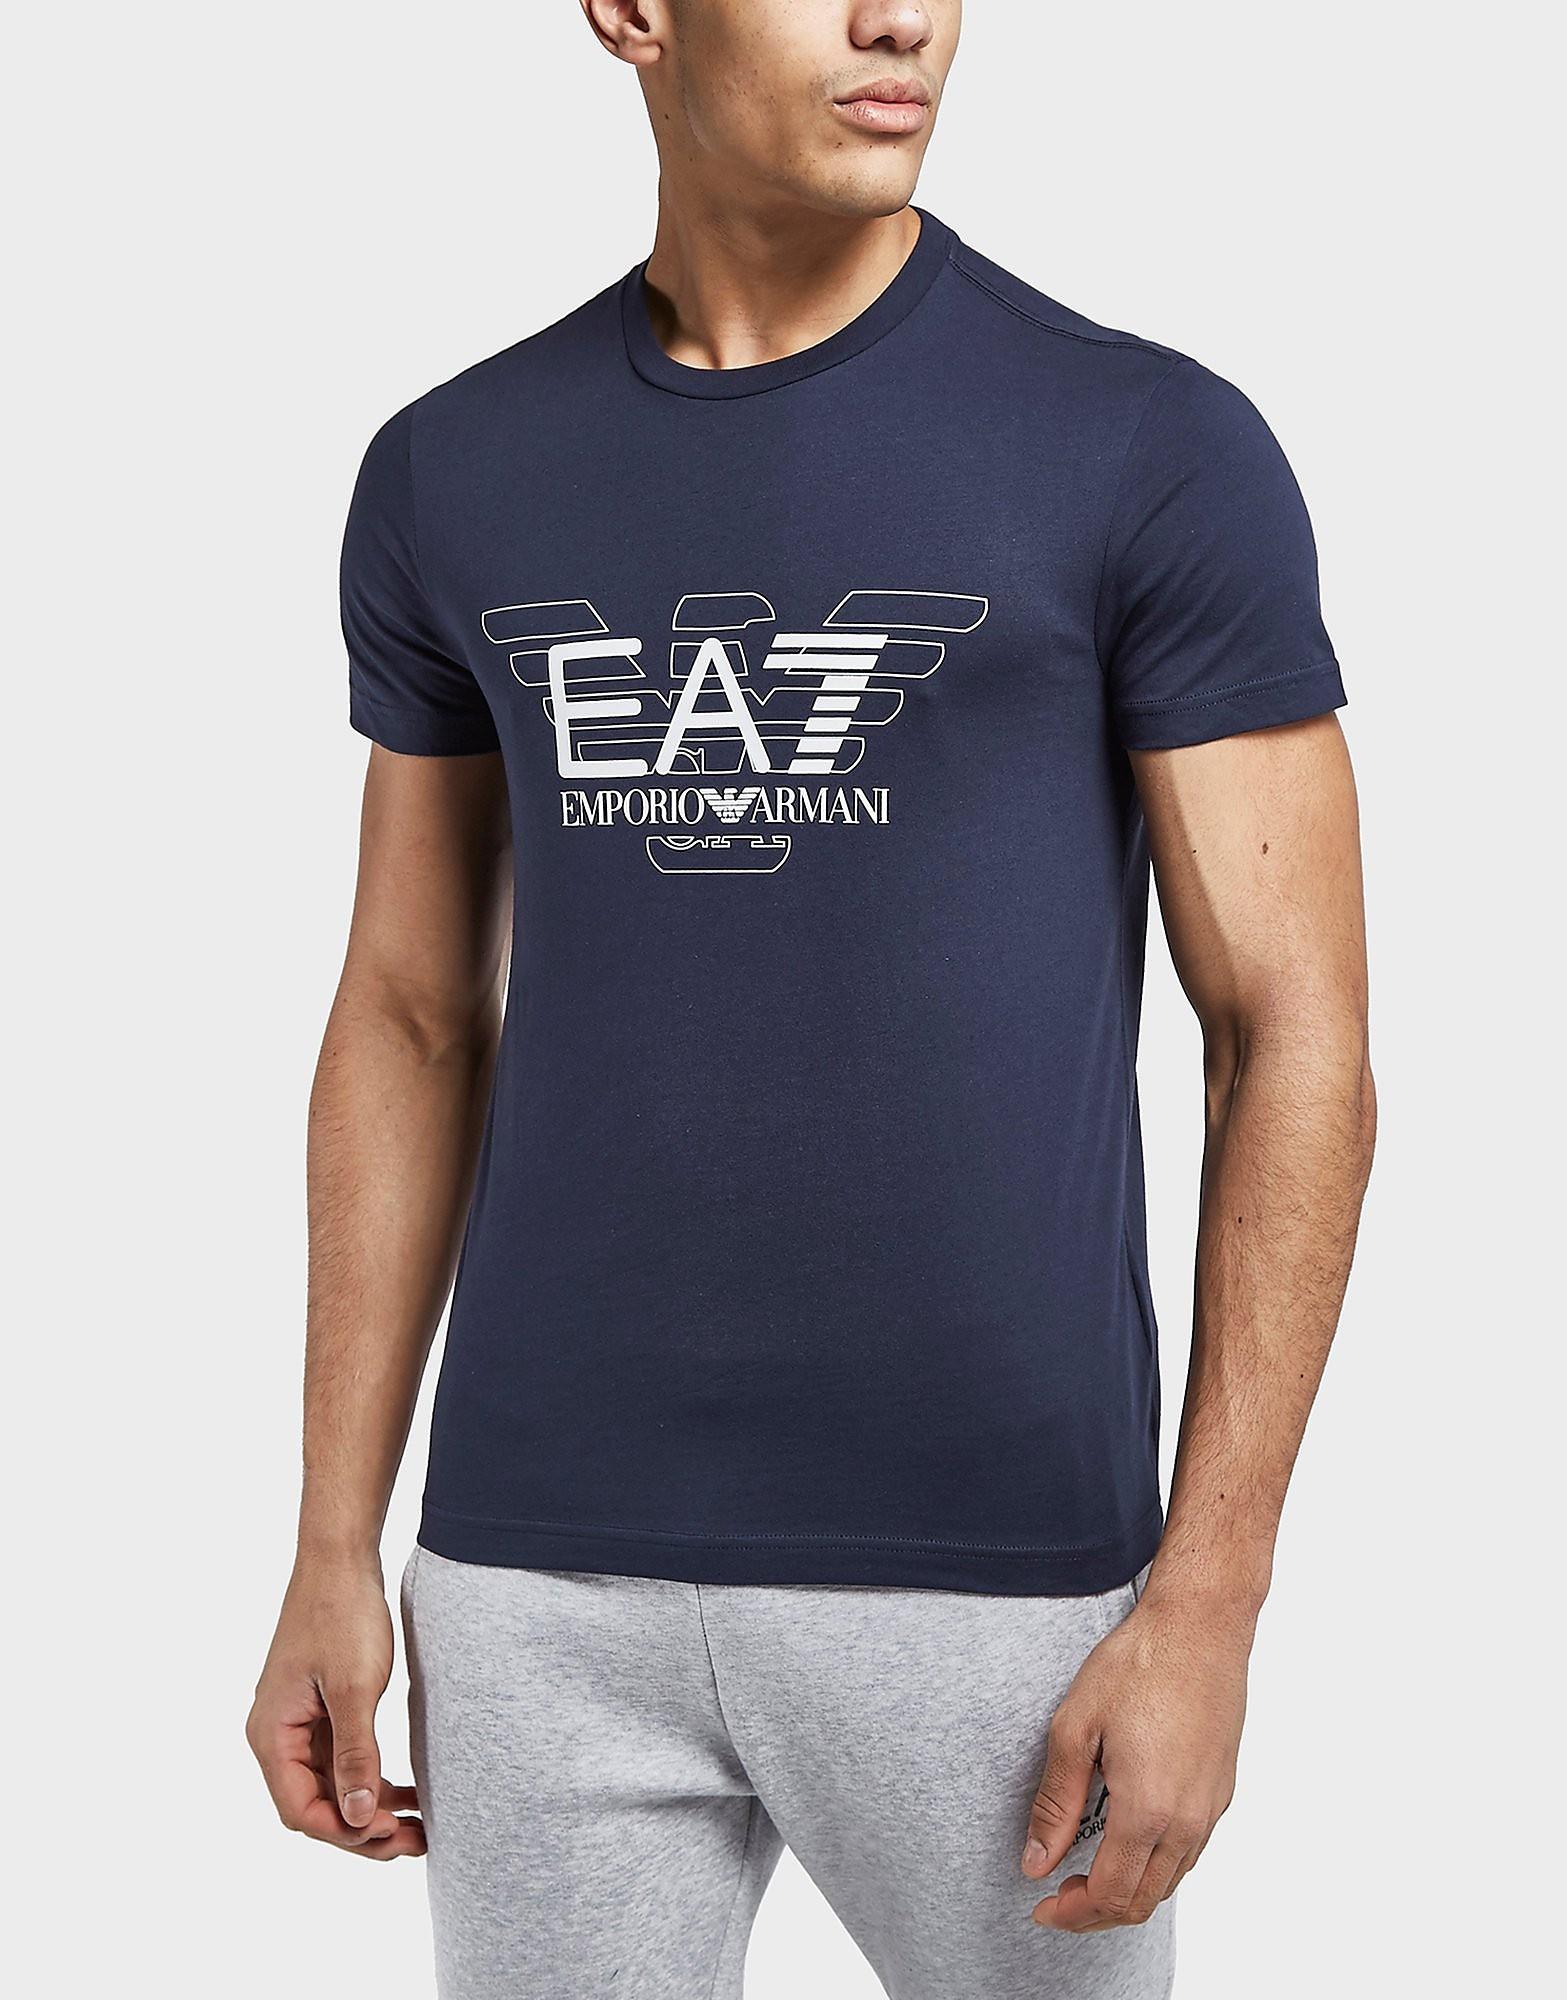 Emporio Armani EA7 Overlay Eagle Short Sleeve T-Shirt